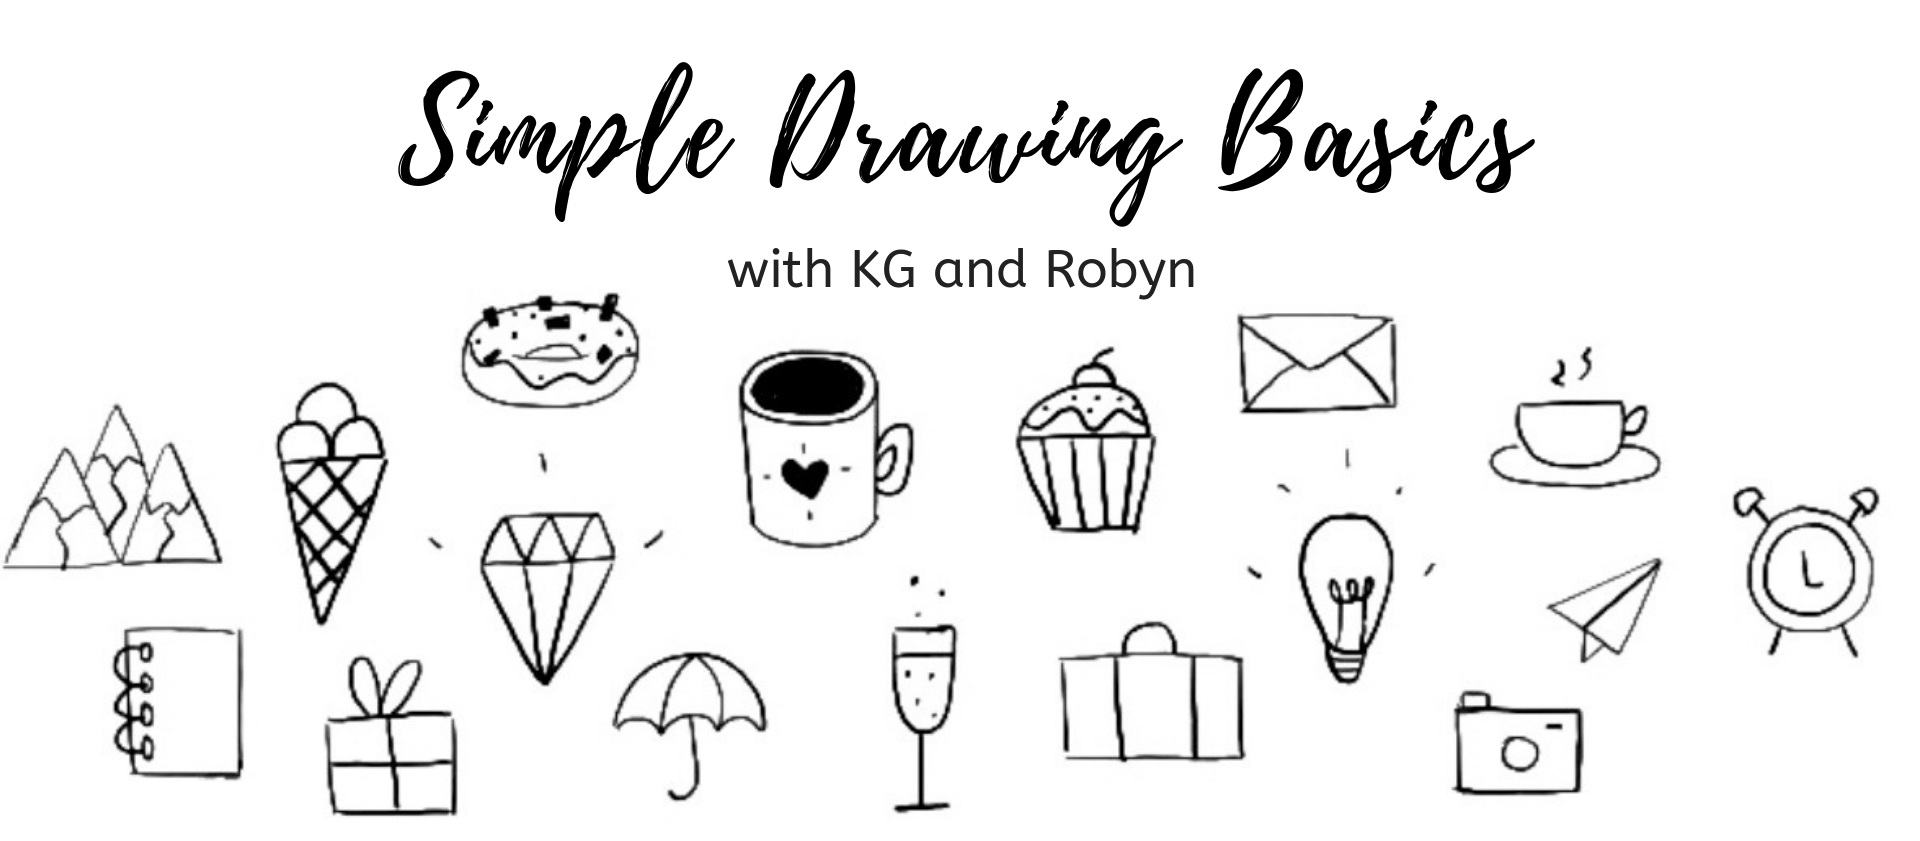 Simple+Drawing+Basics+-+9+June+2019.jpg